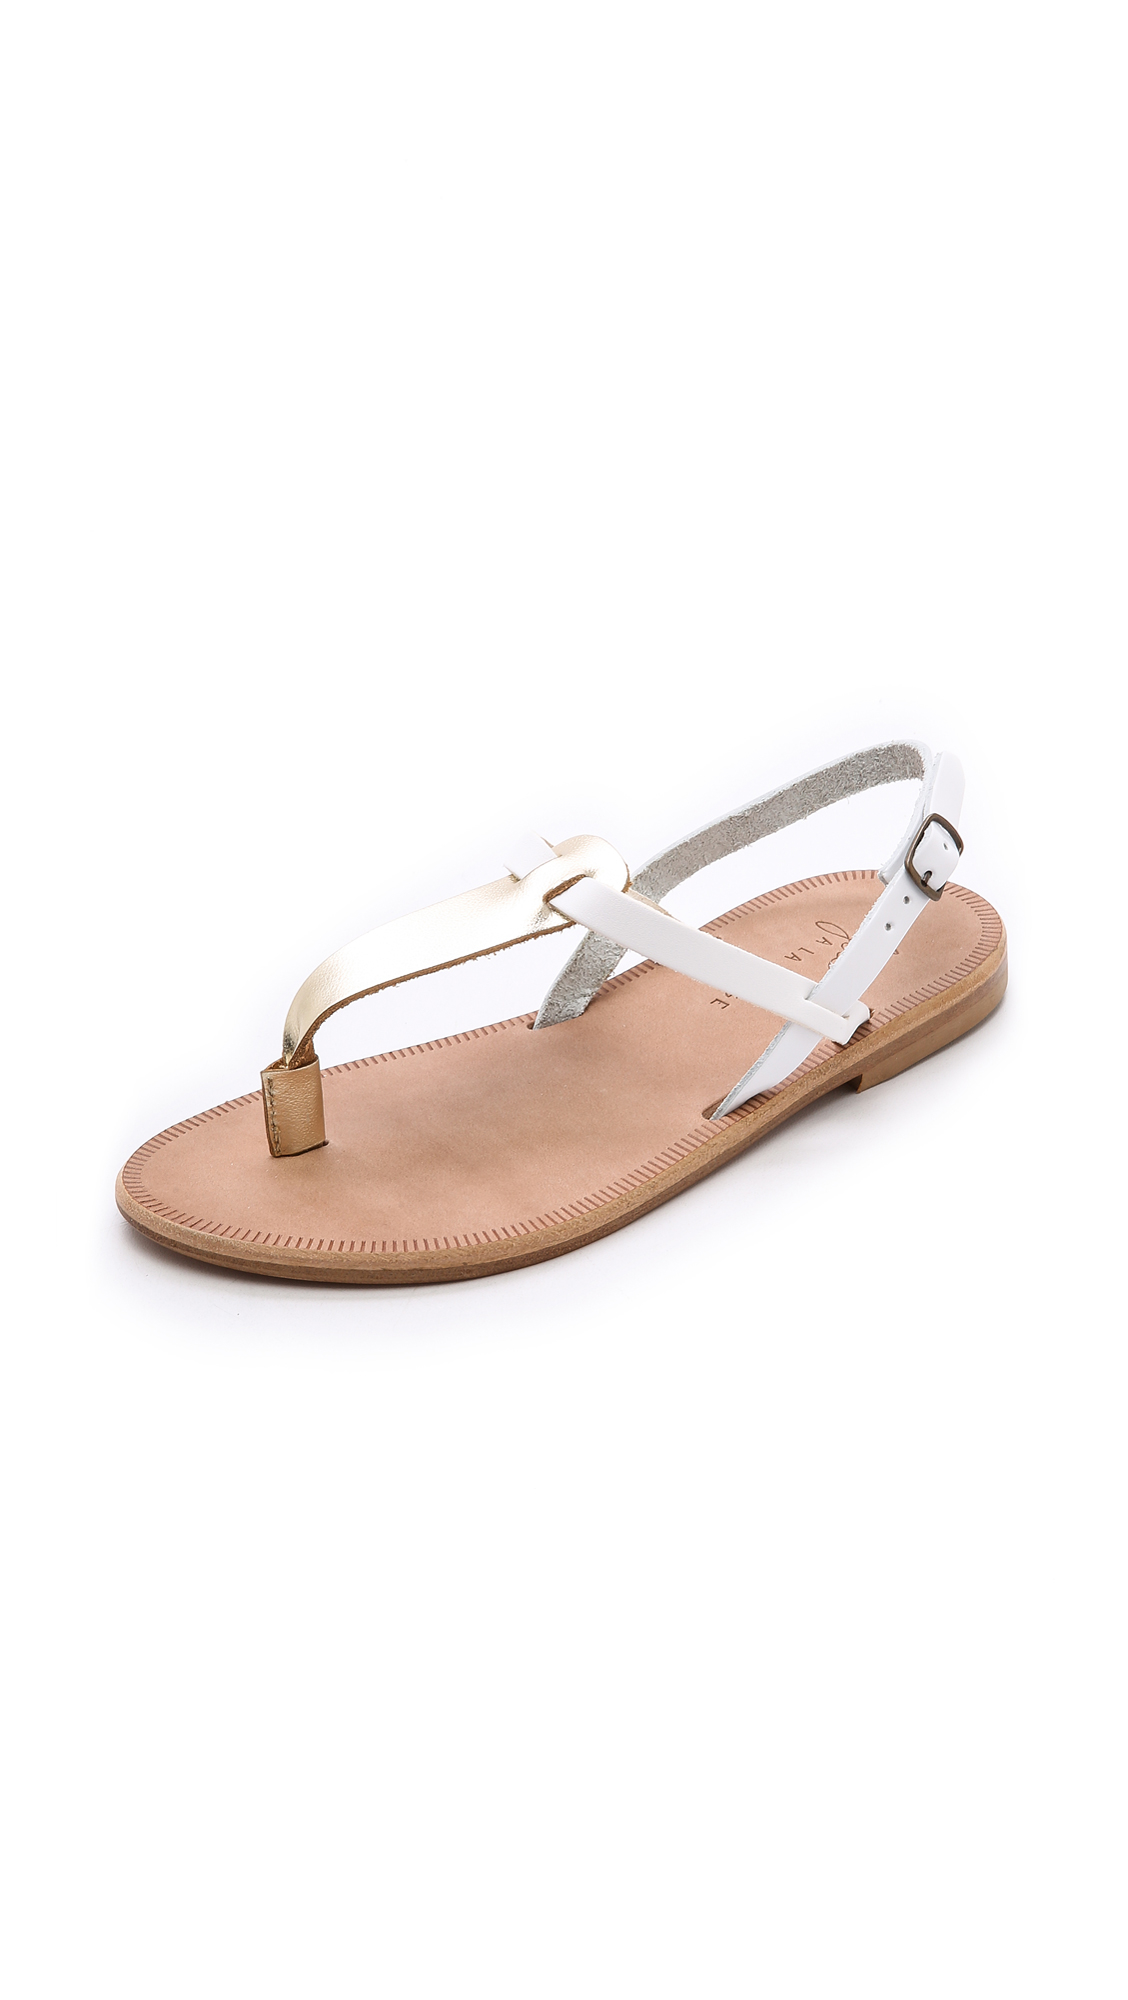 7c9efe45a03f Lyst - Joie A La Plage Topanga Metallic Flat Sandals - White Gold ...